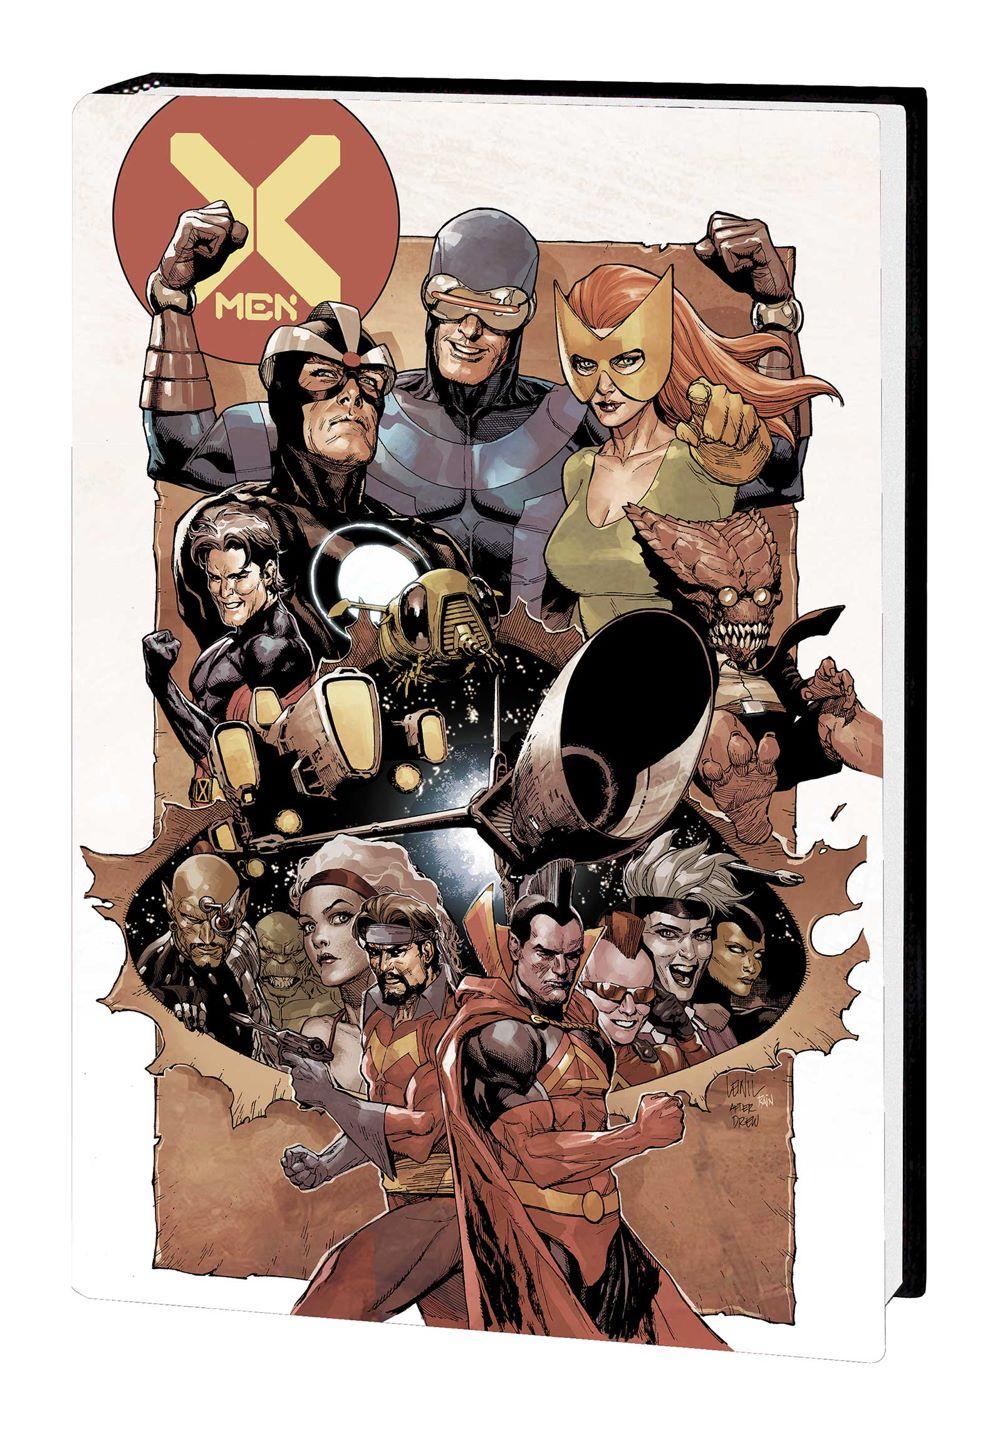 XMEN_JH_OMNIBUS_HC_YU Marvel Comics August 2021 Solicitations